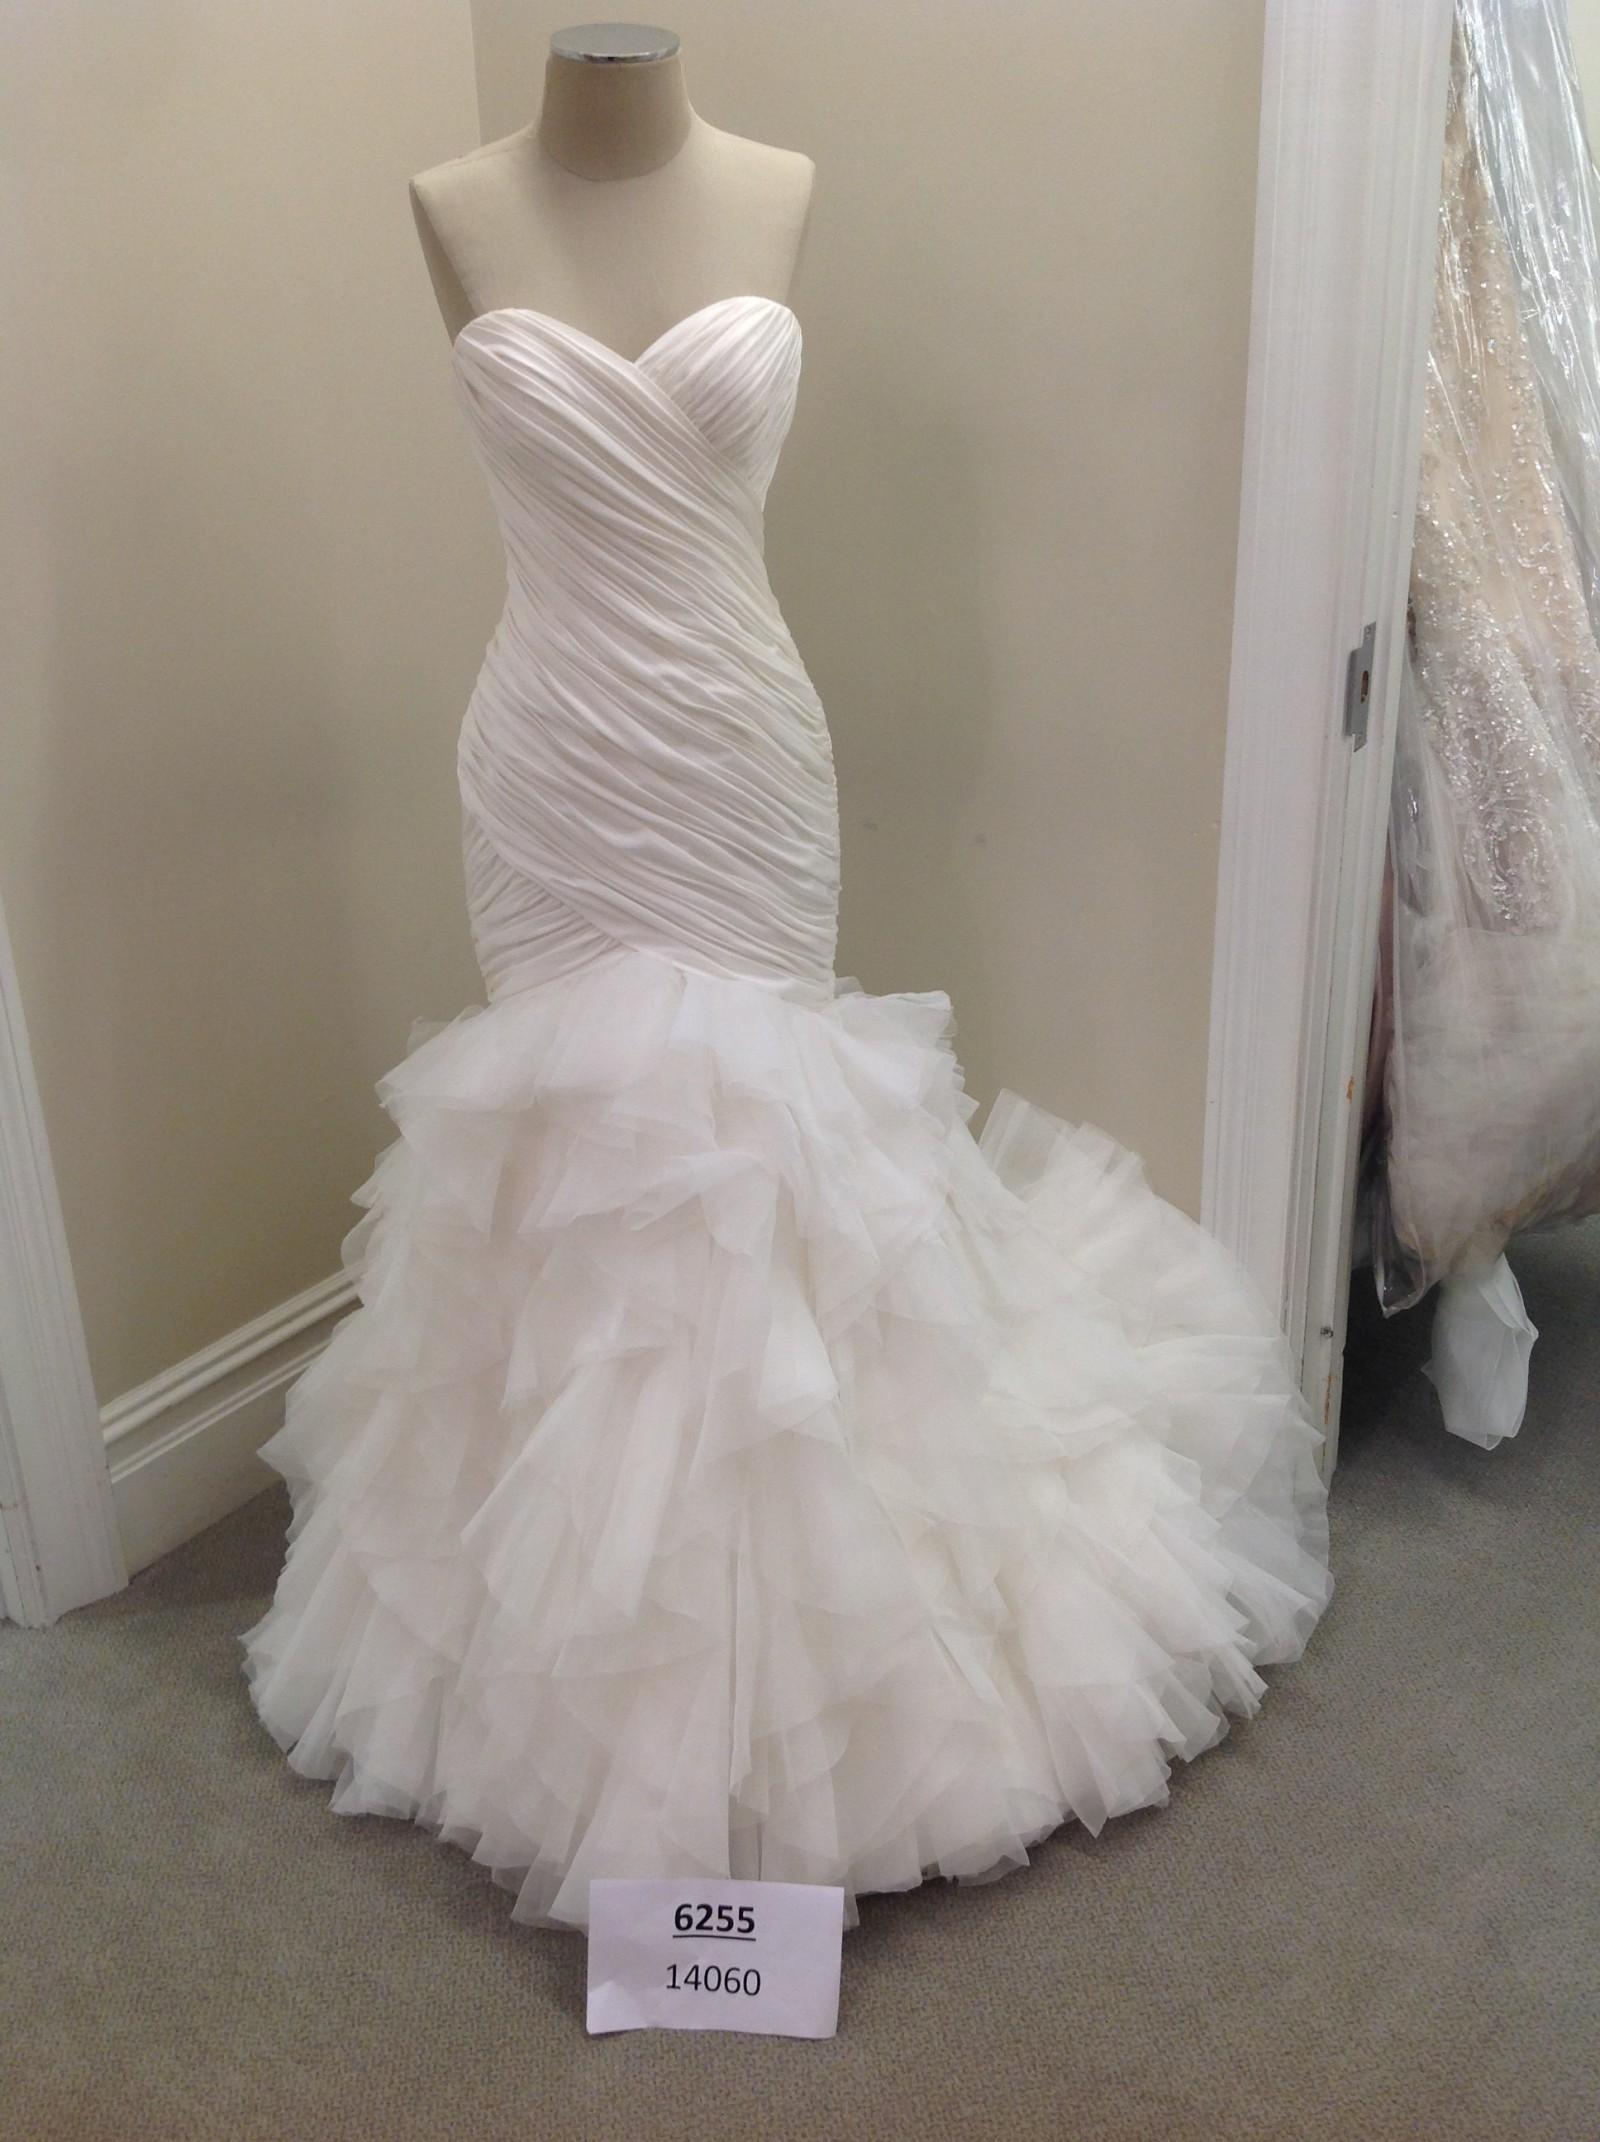 Dennis Basso Wedding Gowns 56 Off Newriversidehotel Com,Wedding Guest Gown Velvet Dresses Pakistani